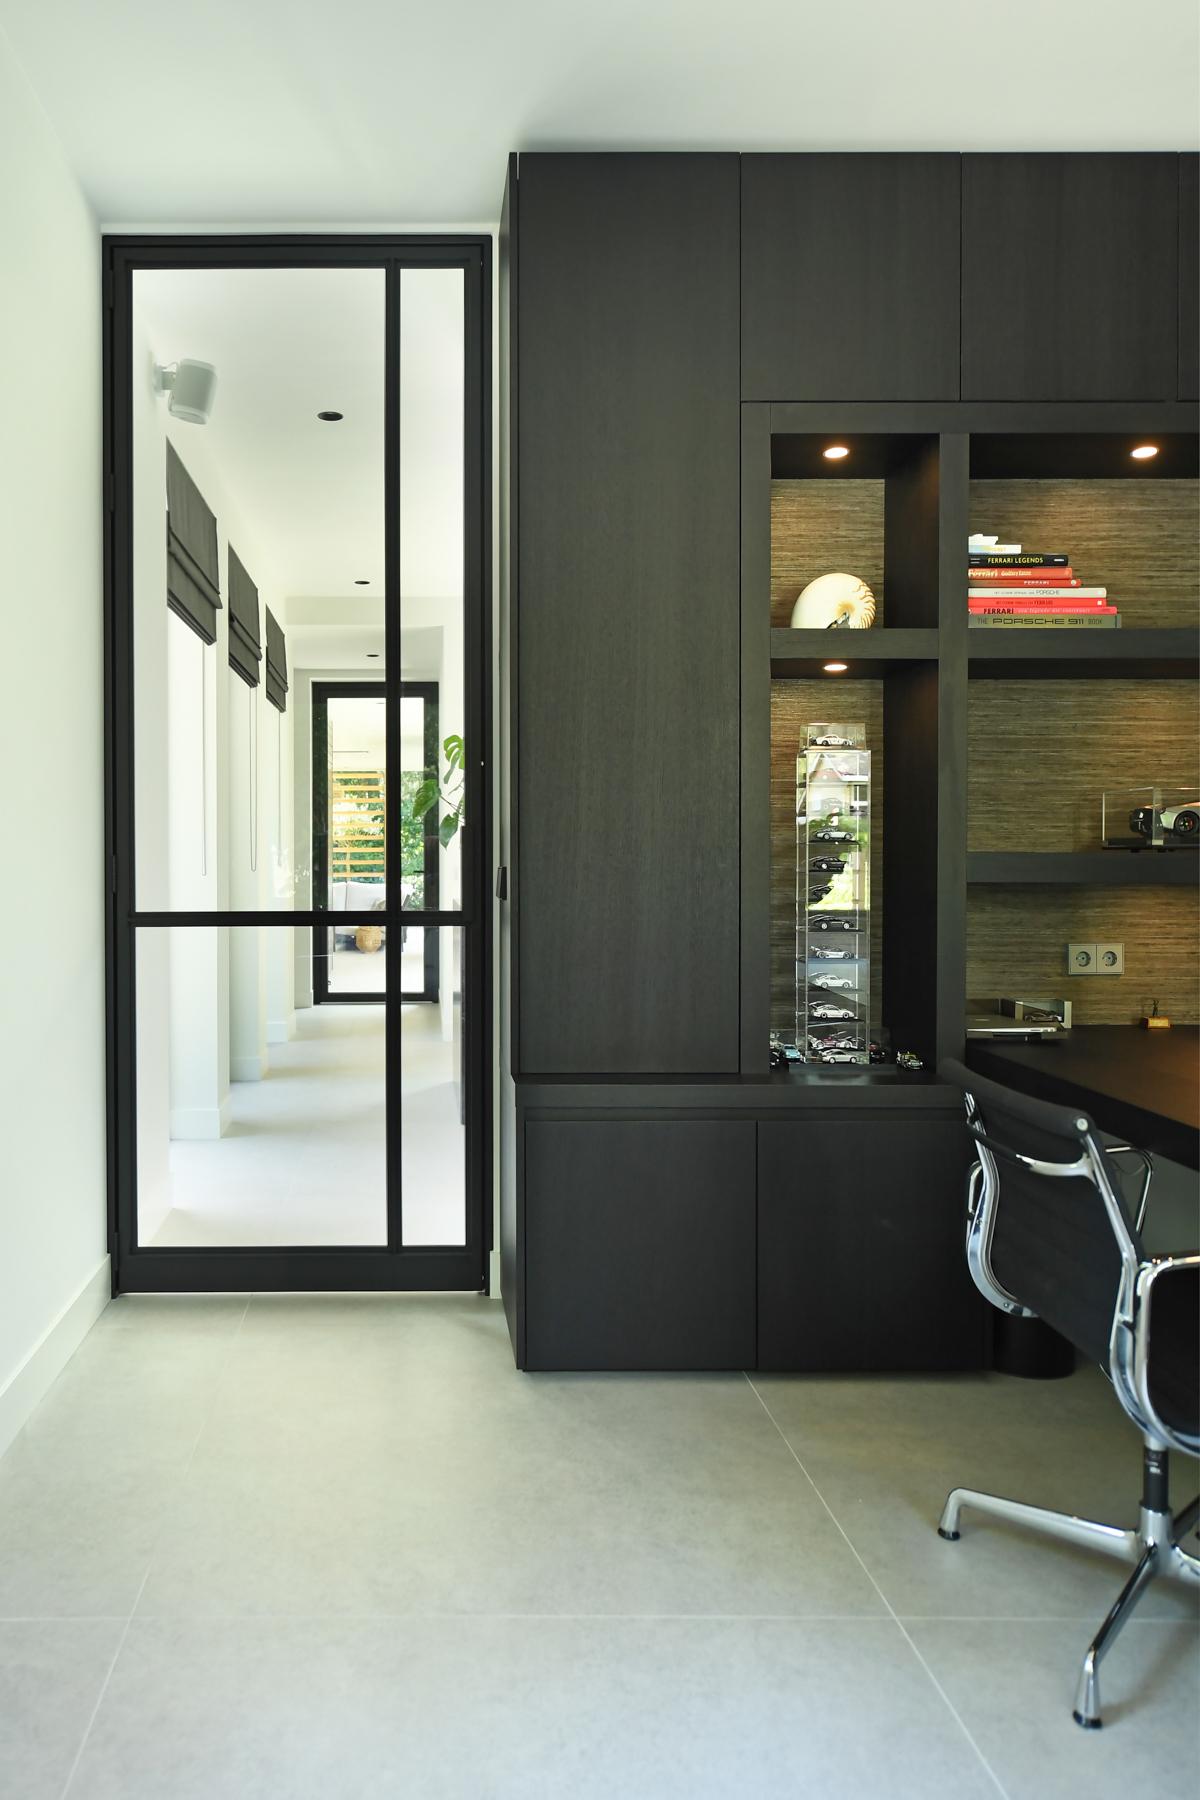 Modern herenhuis met aansprekende architectuur (32)